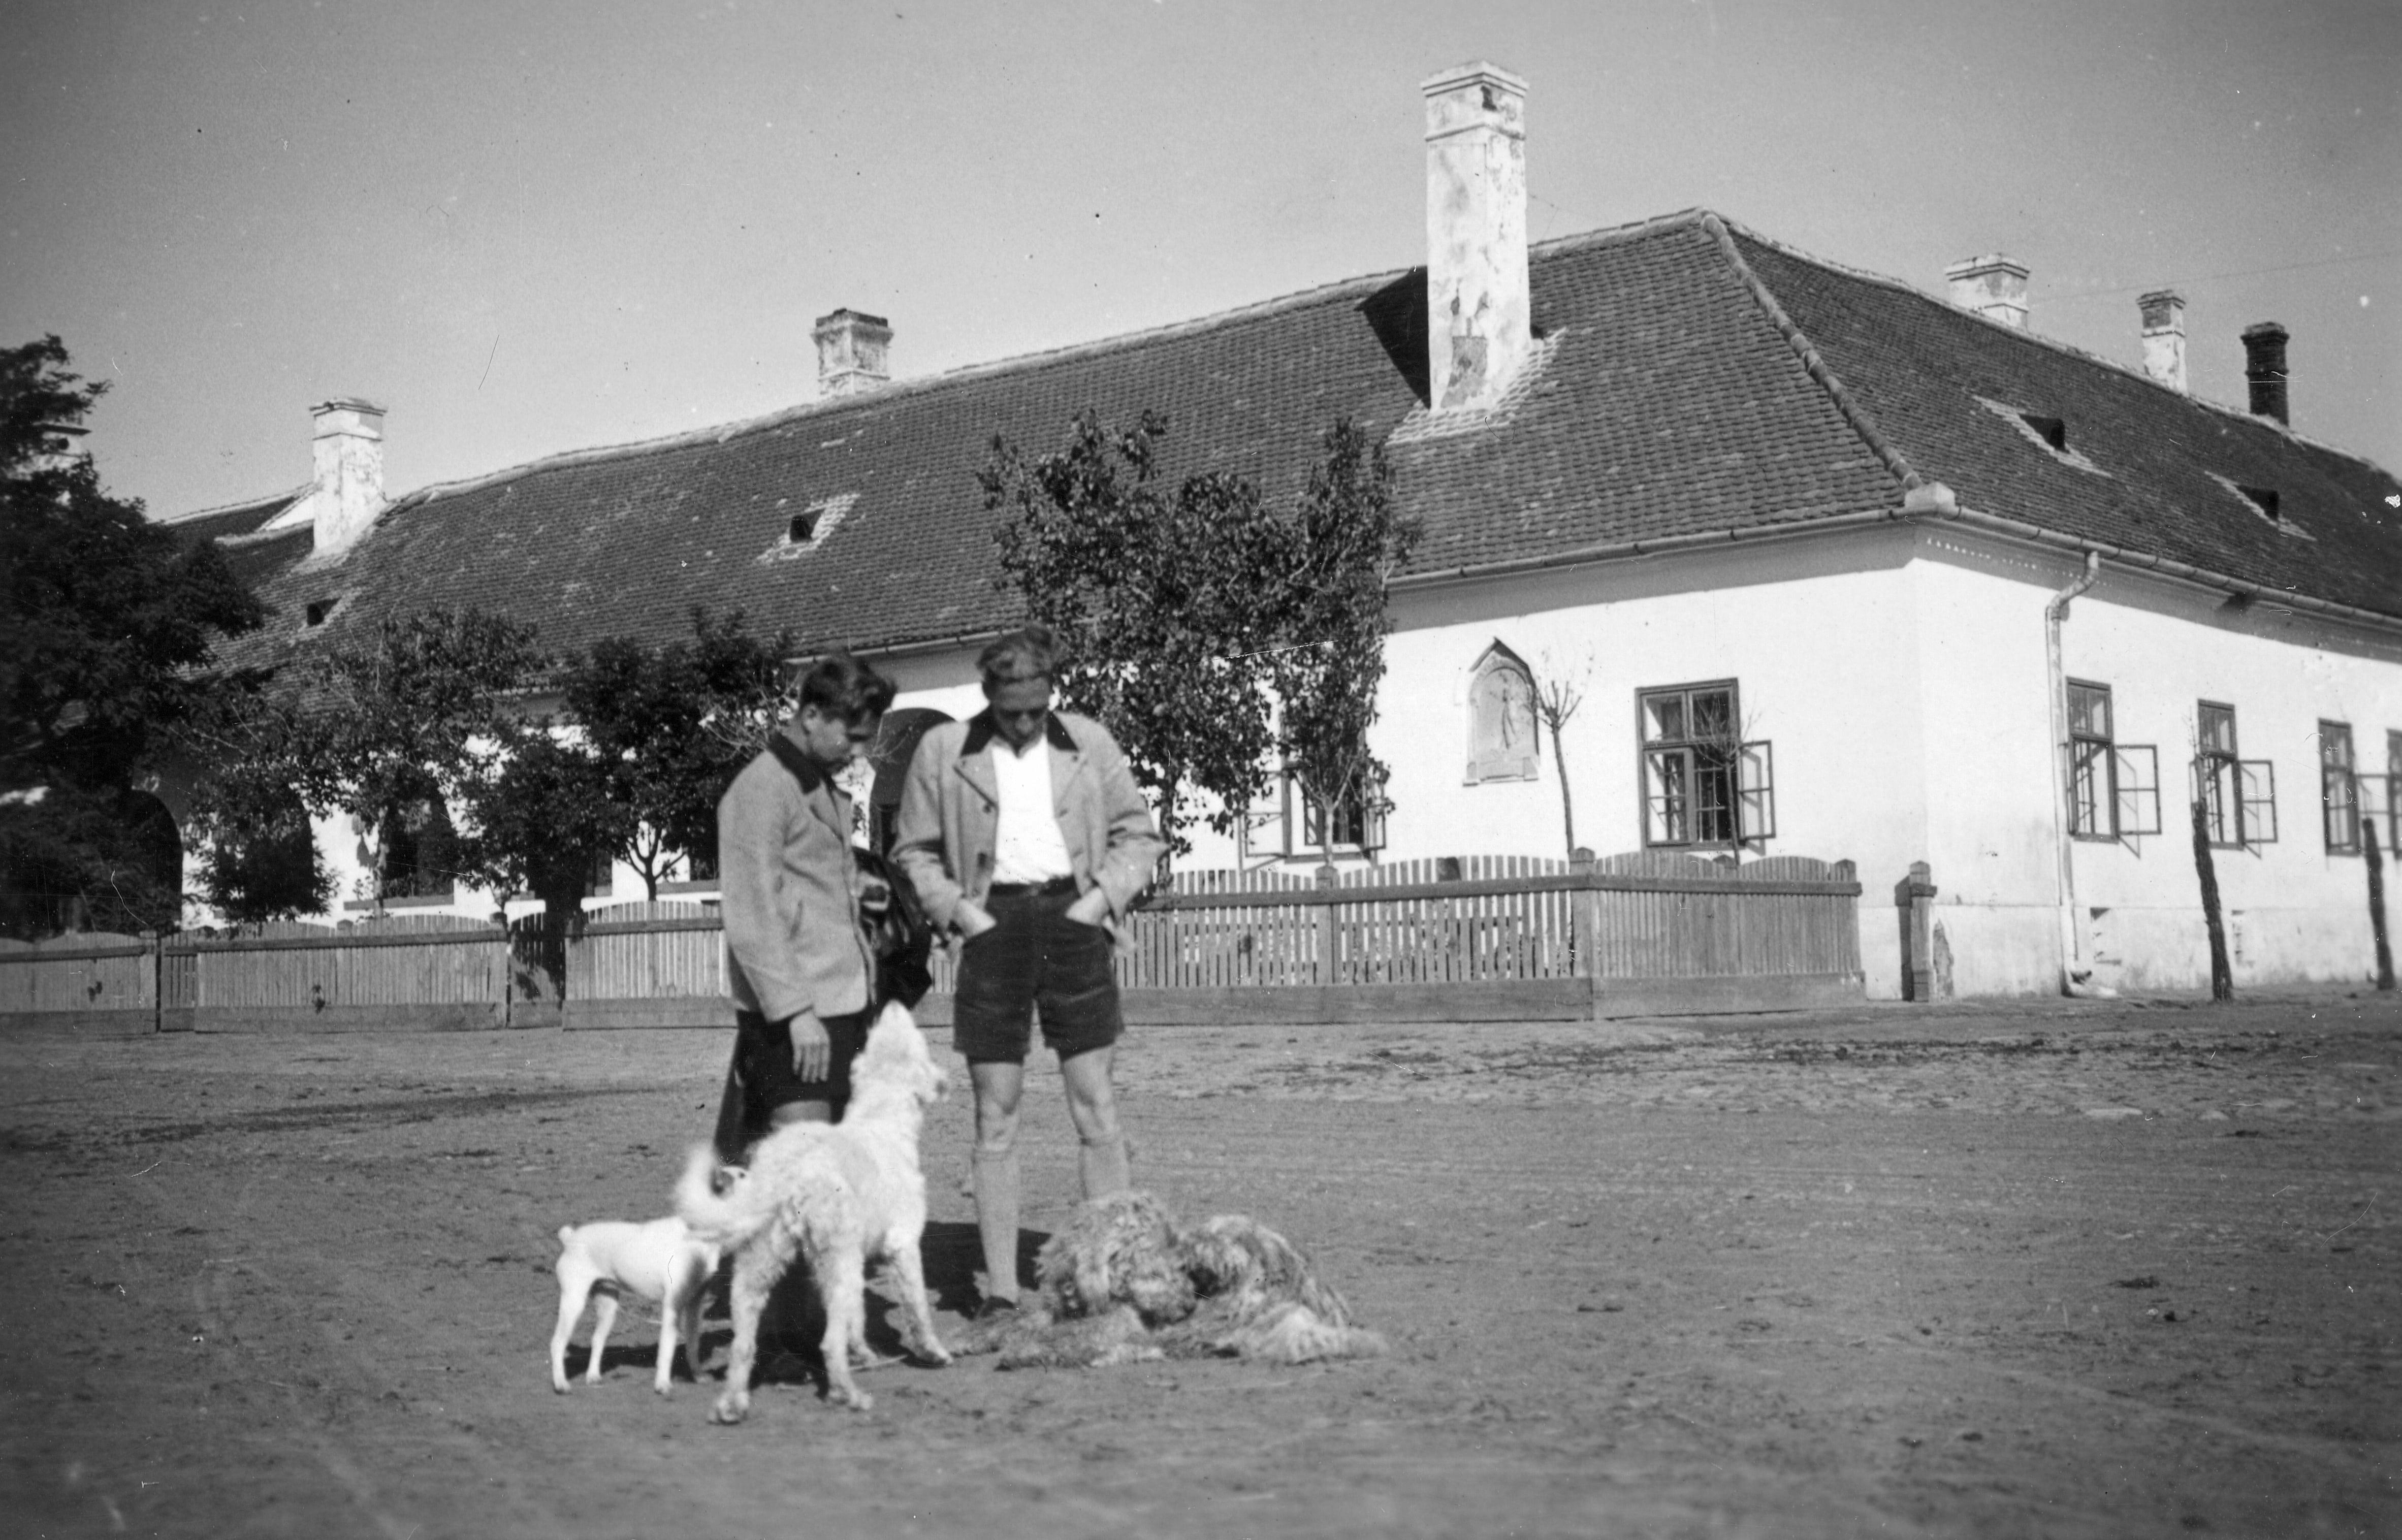 hortobagyi_csarda_a_kilenclyuku_hidnal_ted_grauthoff_1935-min.jpg